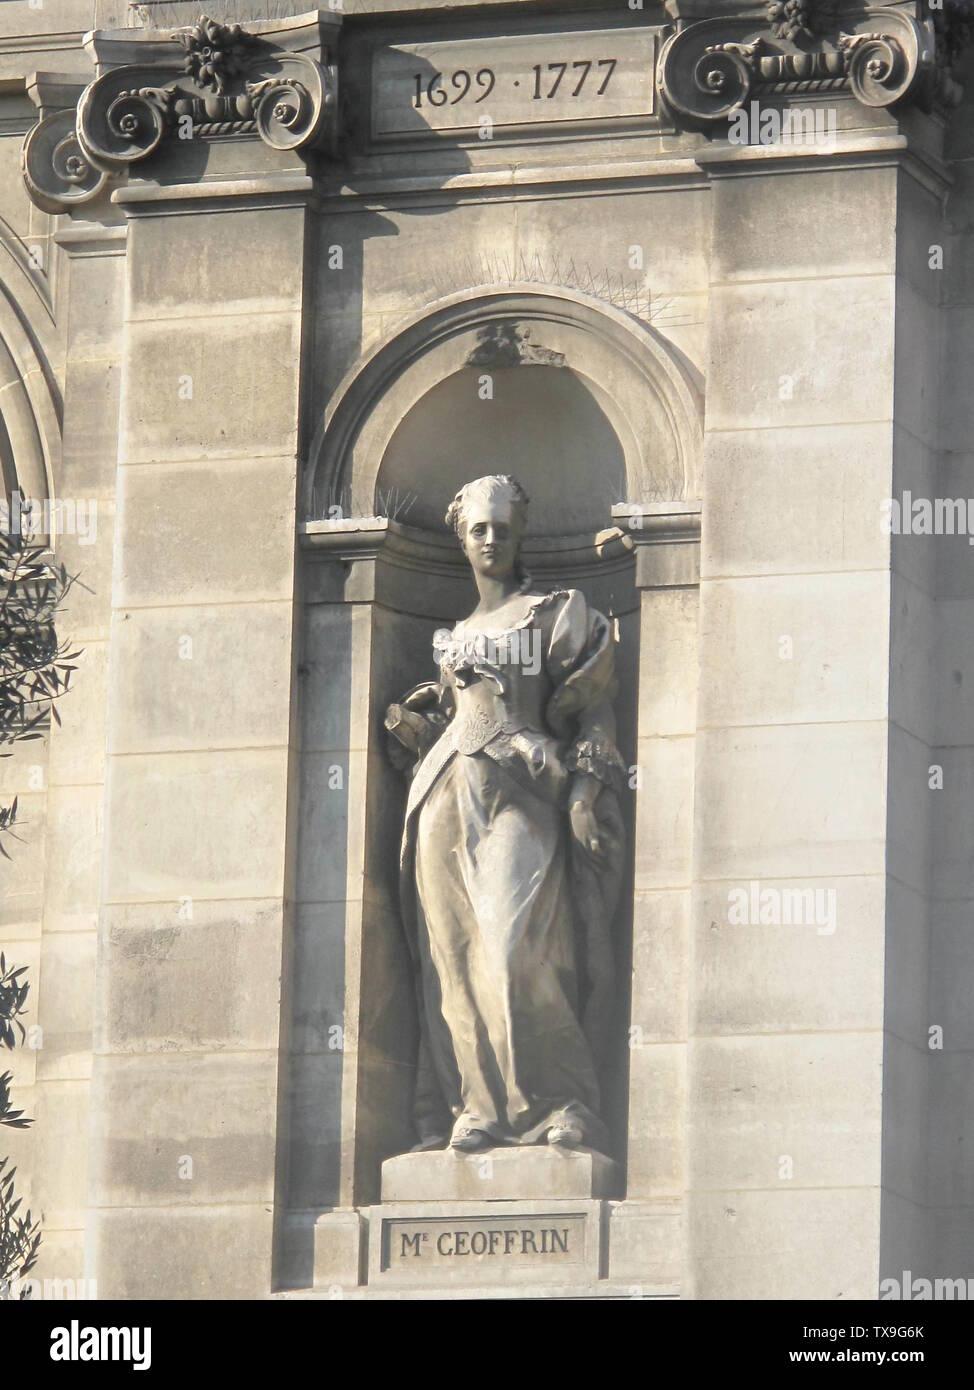 'English: Statue of Madame Geoffrin among the important people of the french history at the Hôtel de Ville (=town hall) of Paris. Paris 4th arr. Français: Statue de Madame Geoffrin parmi les personnages de l'histoire de France de l'Hôtel de Ville de Paris. Paris 4e arr.; 23 April 2010; Own work; Tangopaso; ' - Stock Image